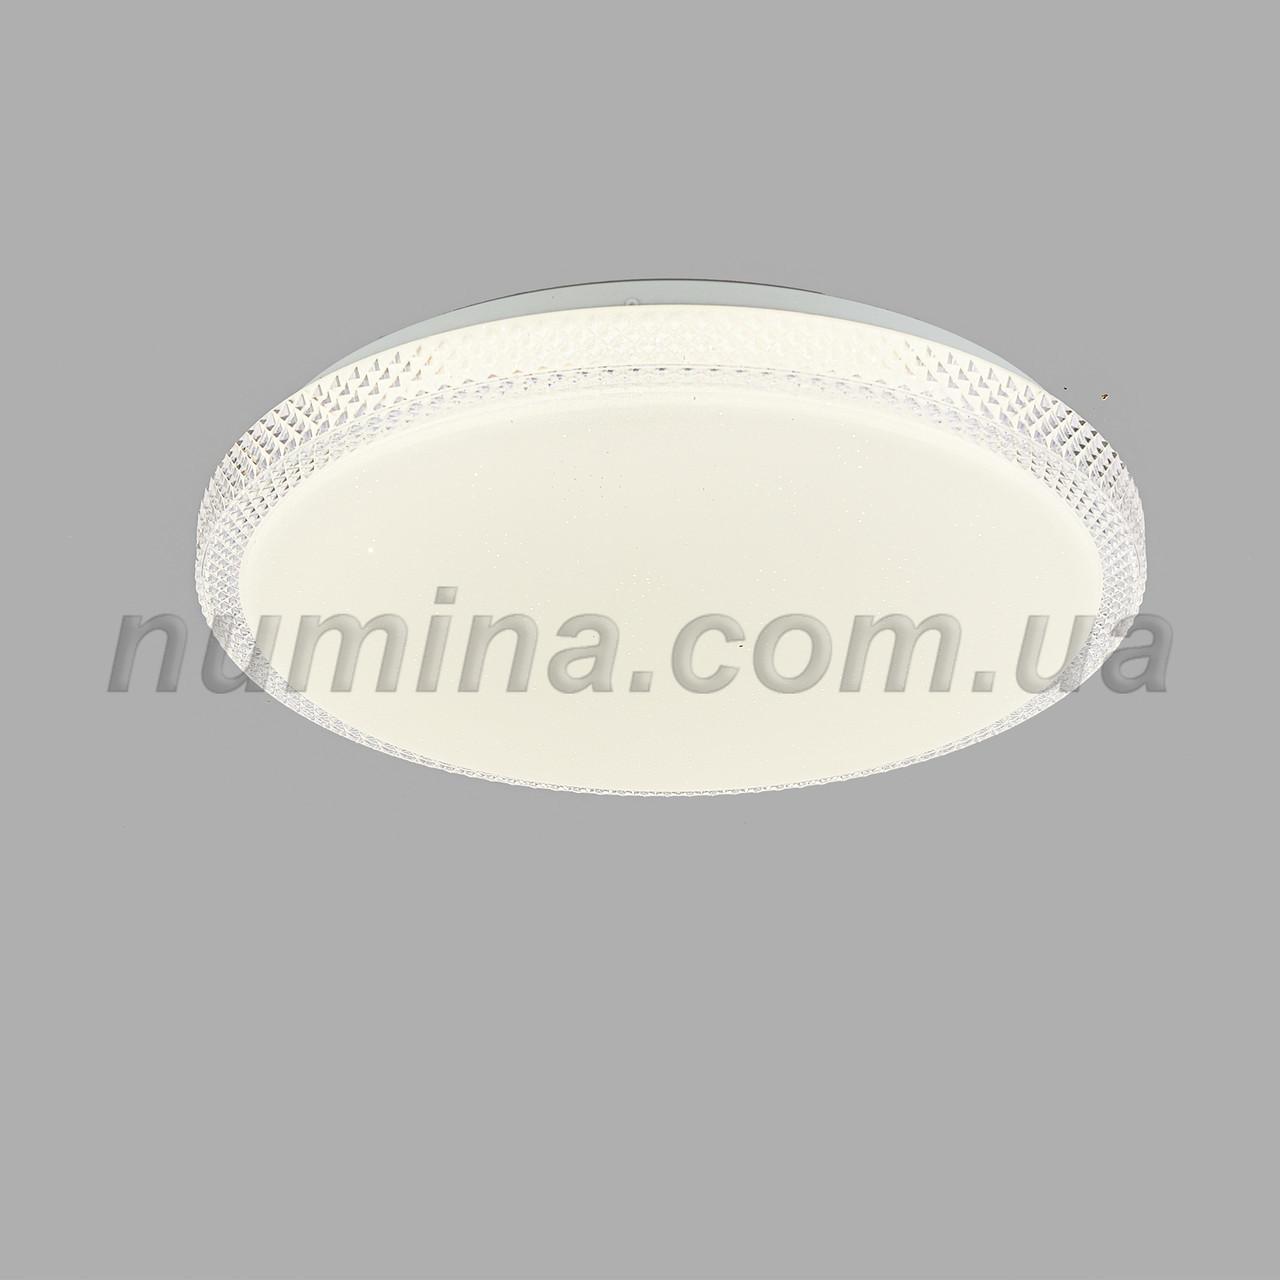 Люстра потолочная LED 69-3003-L 72W